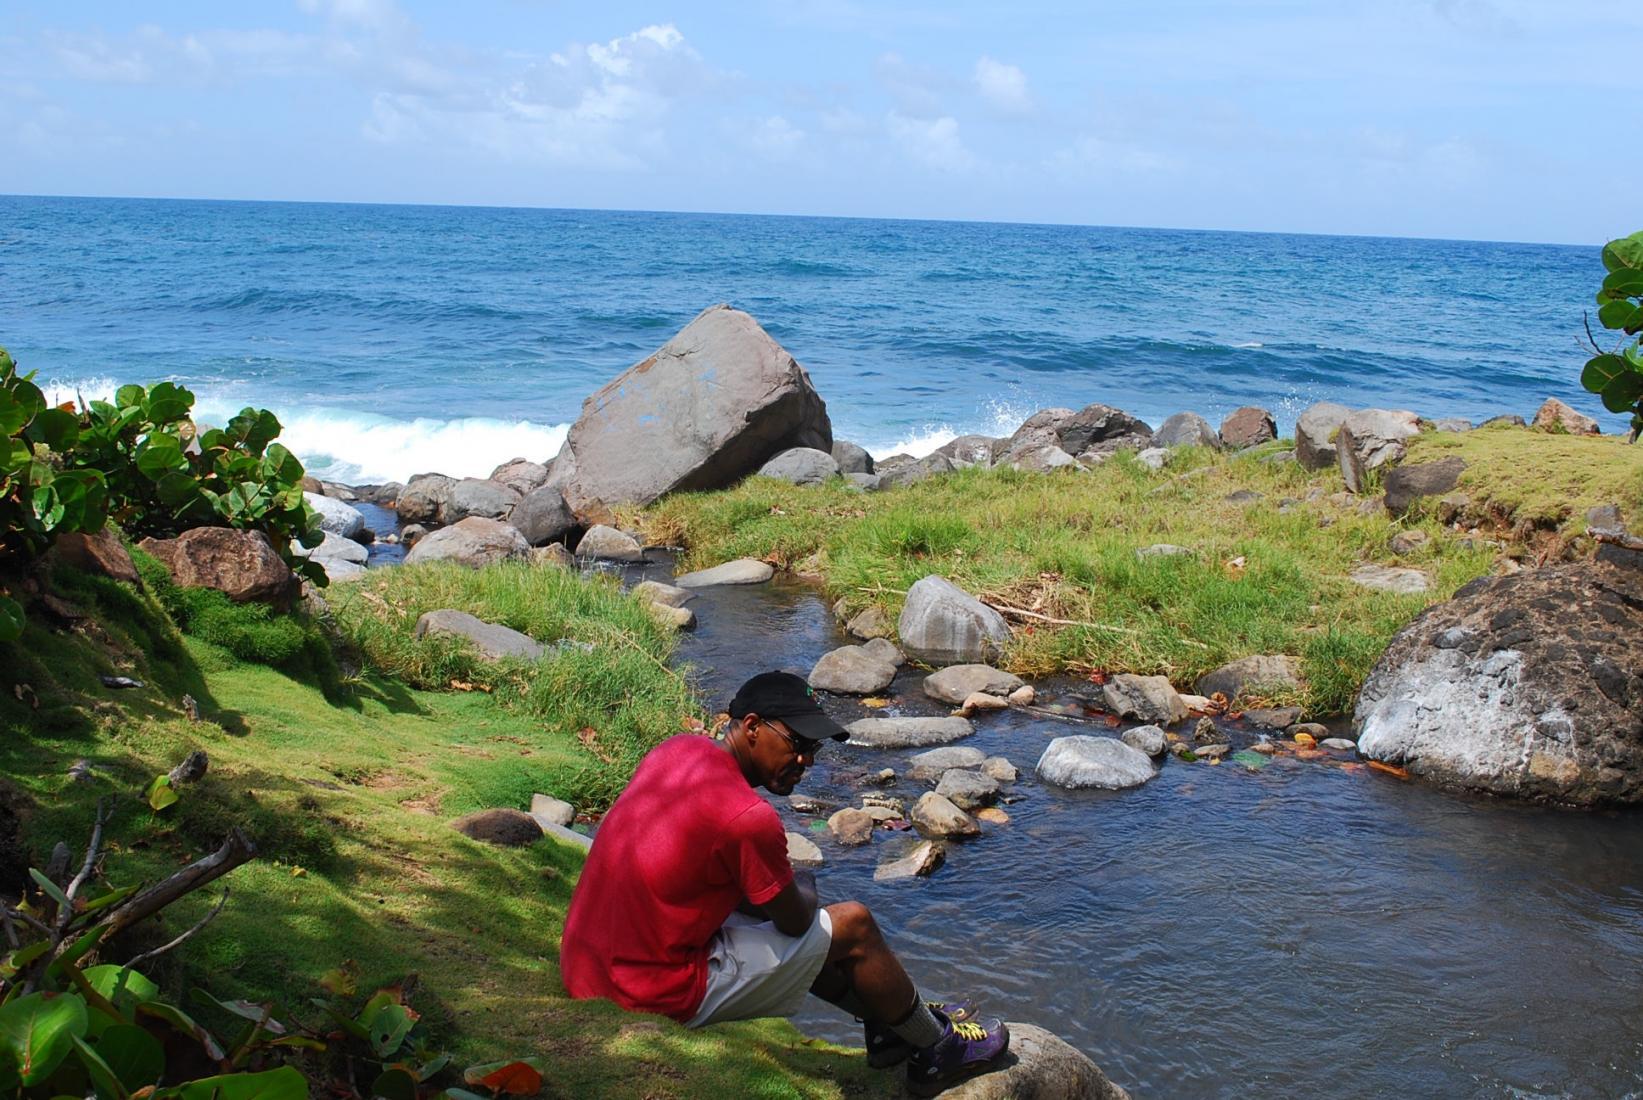 Hiking Dominica's national trail. Photo: Tonya Fitzpatrick